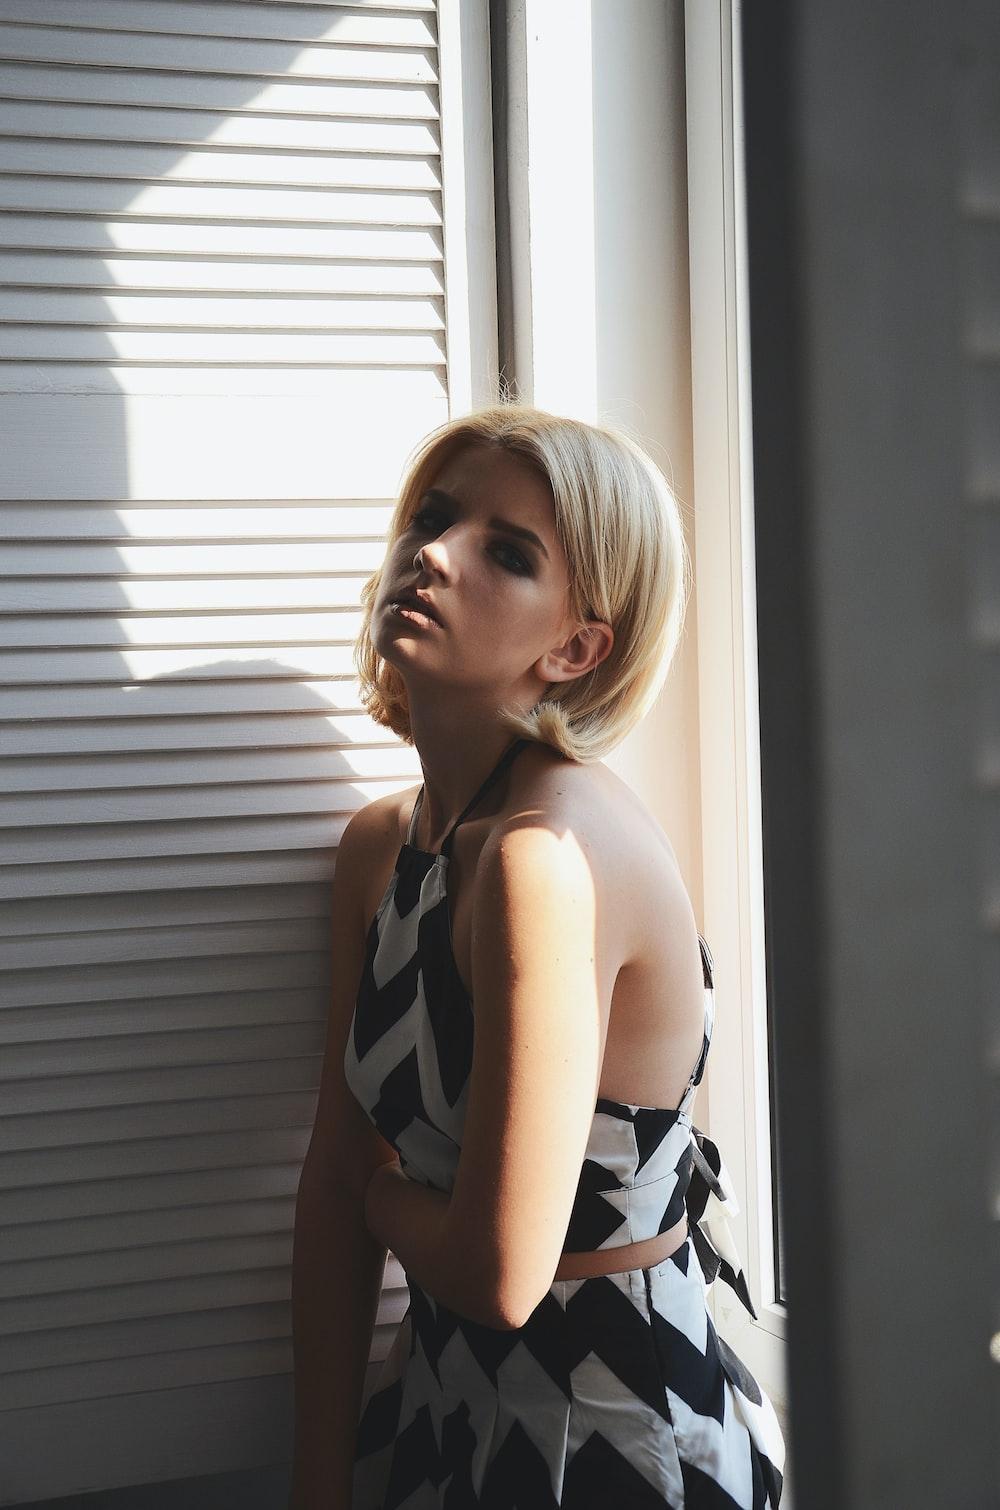 woman in black and white polka dot bikini top